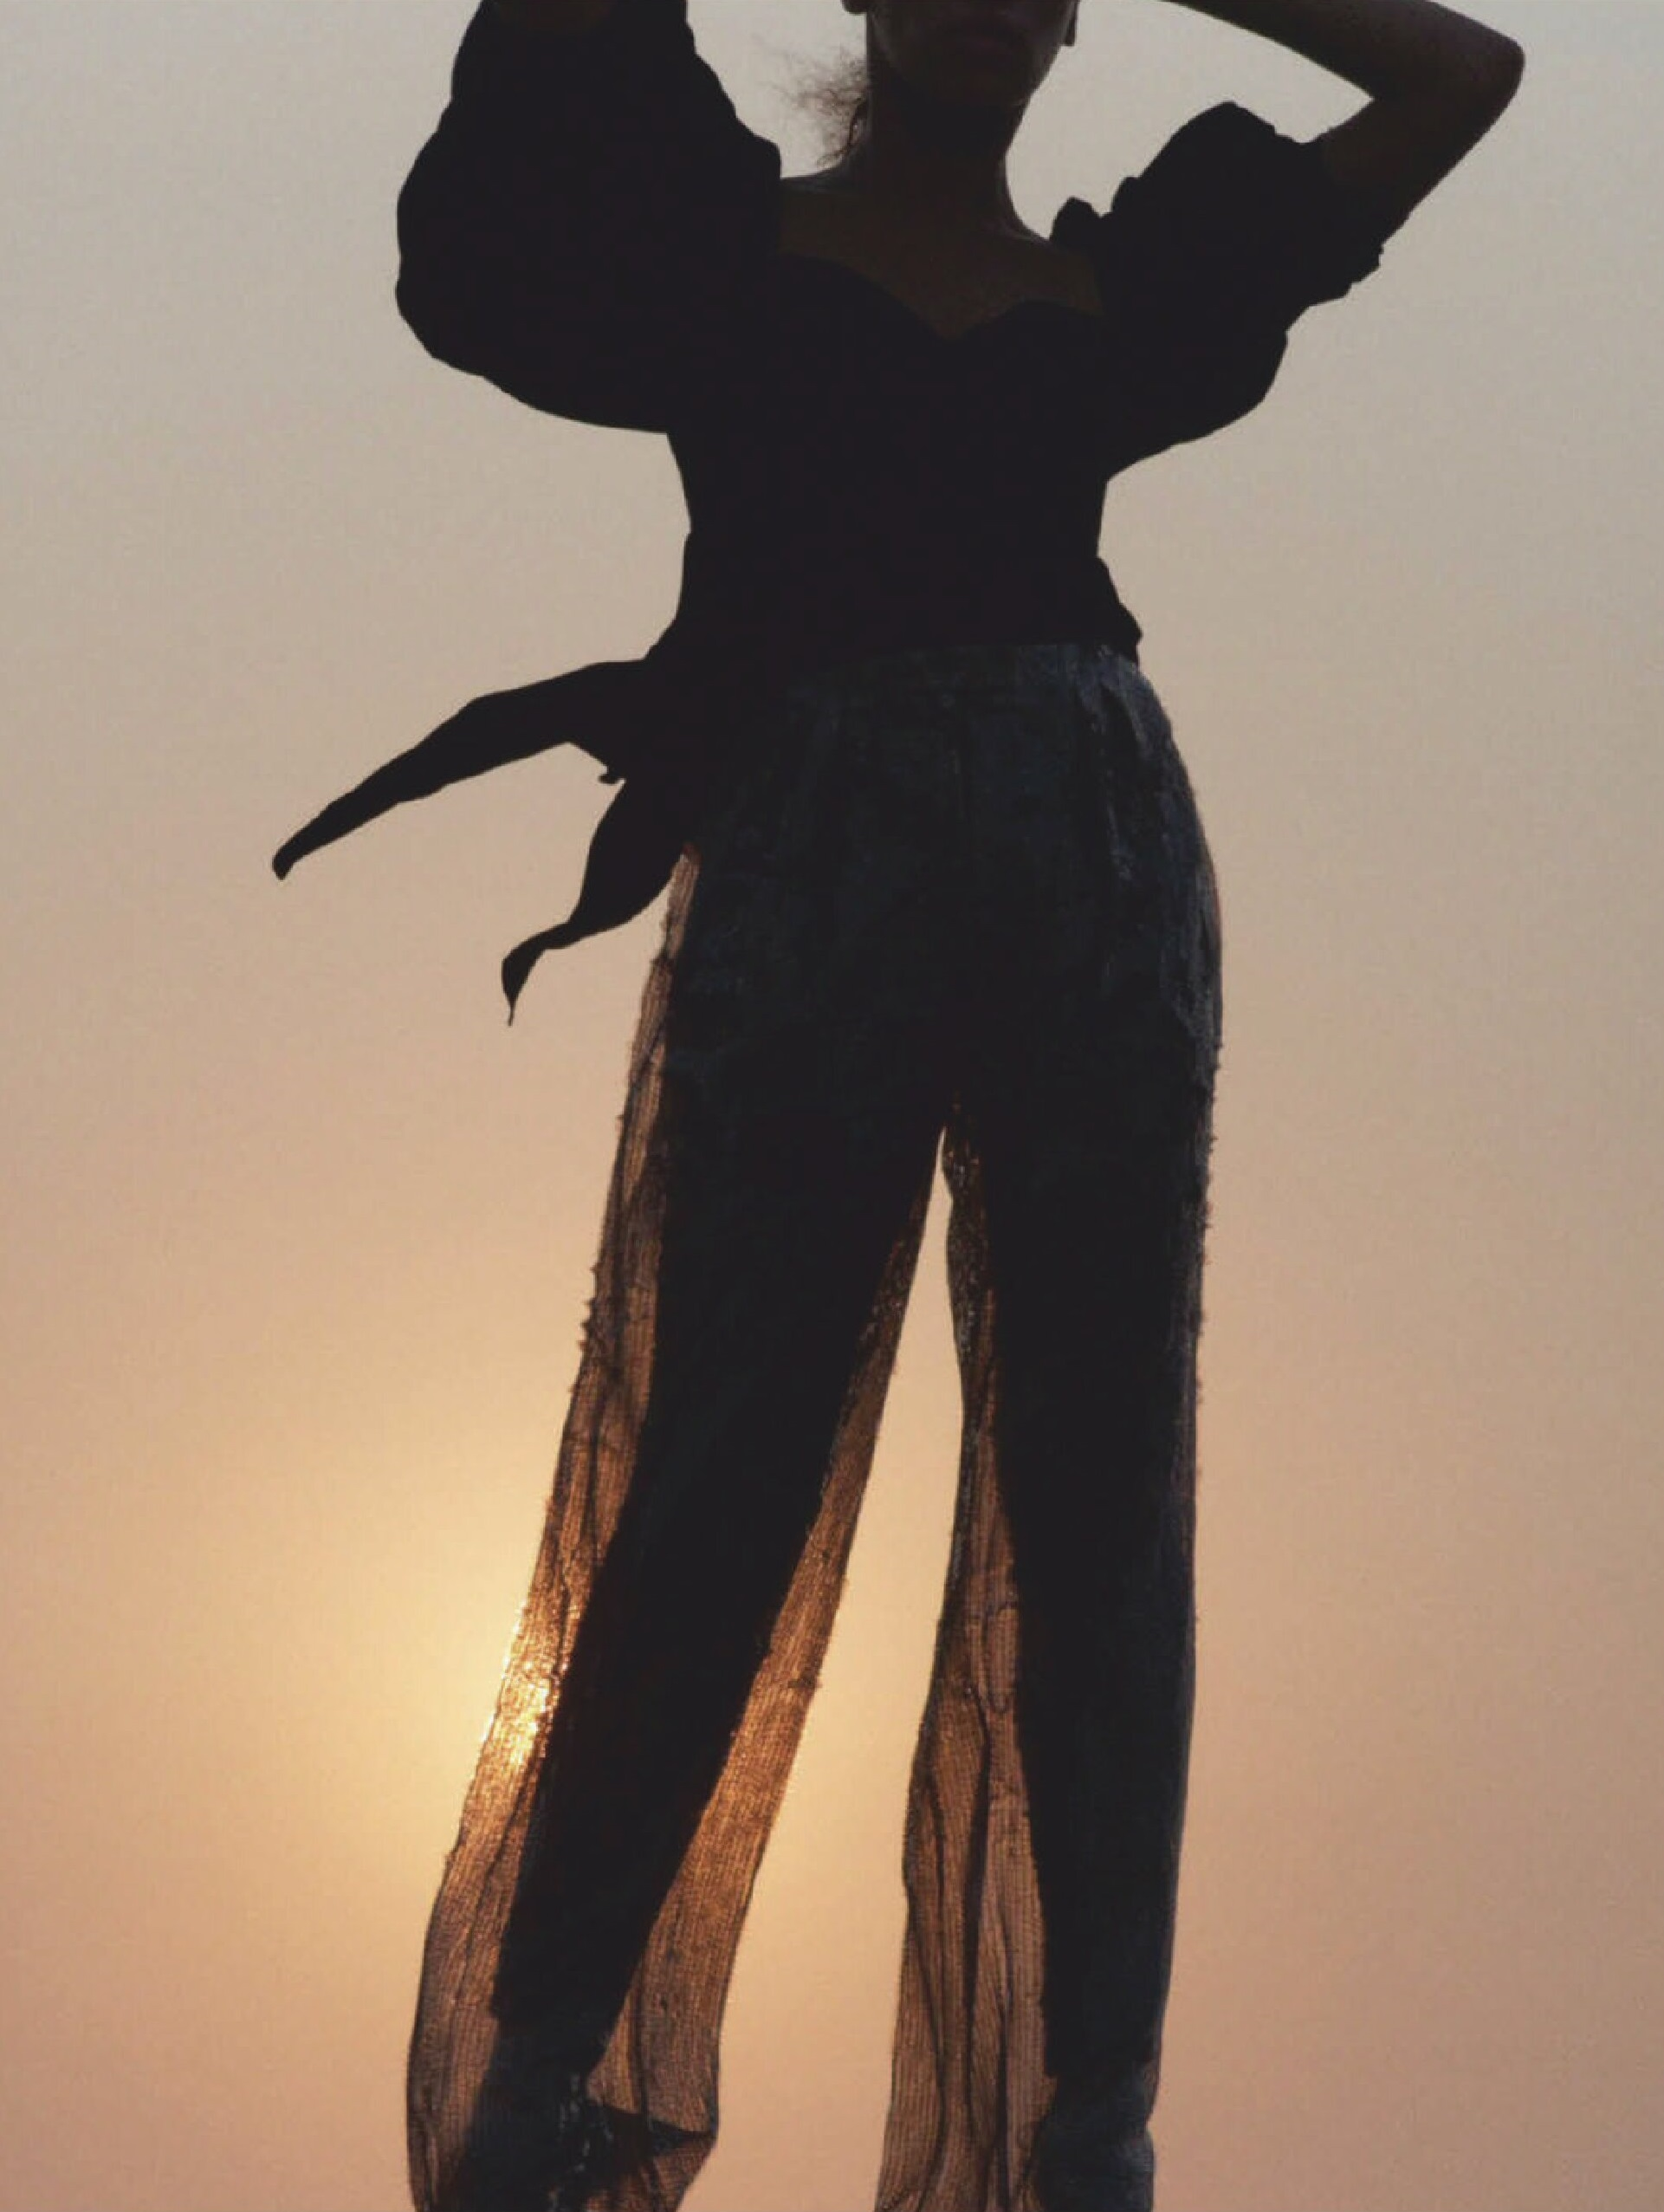 Khadija-Red-Thunder-Bjorn-Iooss-Vogue-Latin-America-May-2019- (7).jpg